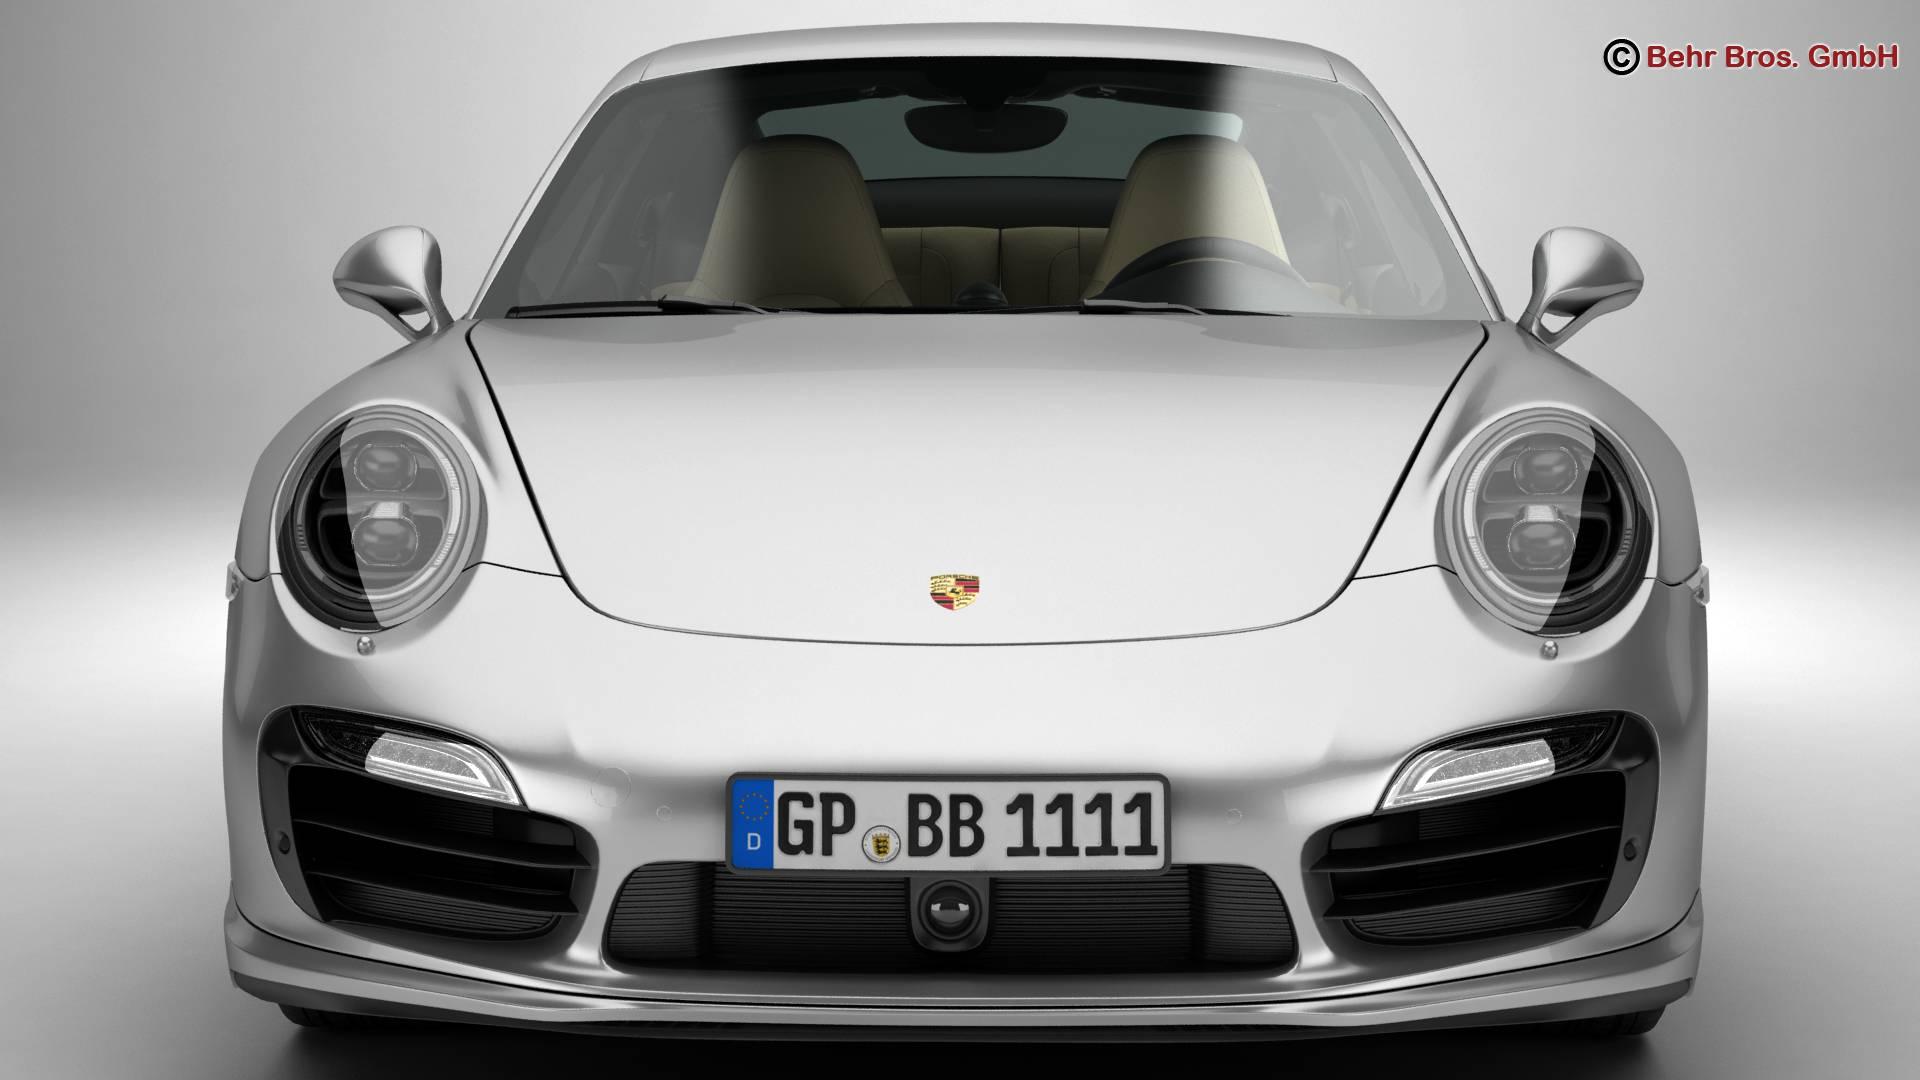 porsche 911 turbo s 2014 3d model 3ds max fbx c4d lwo ma mb obj 212481